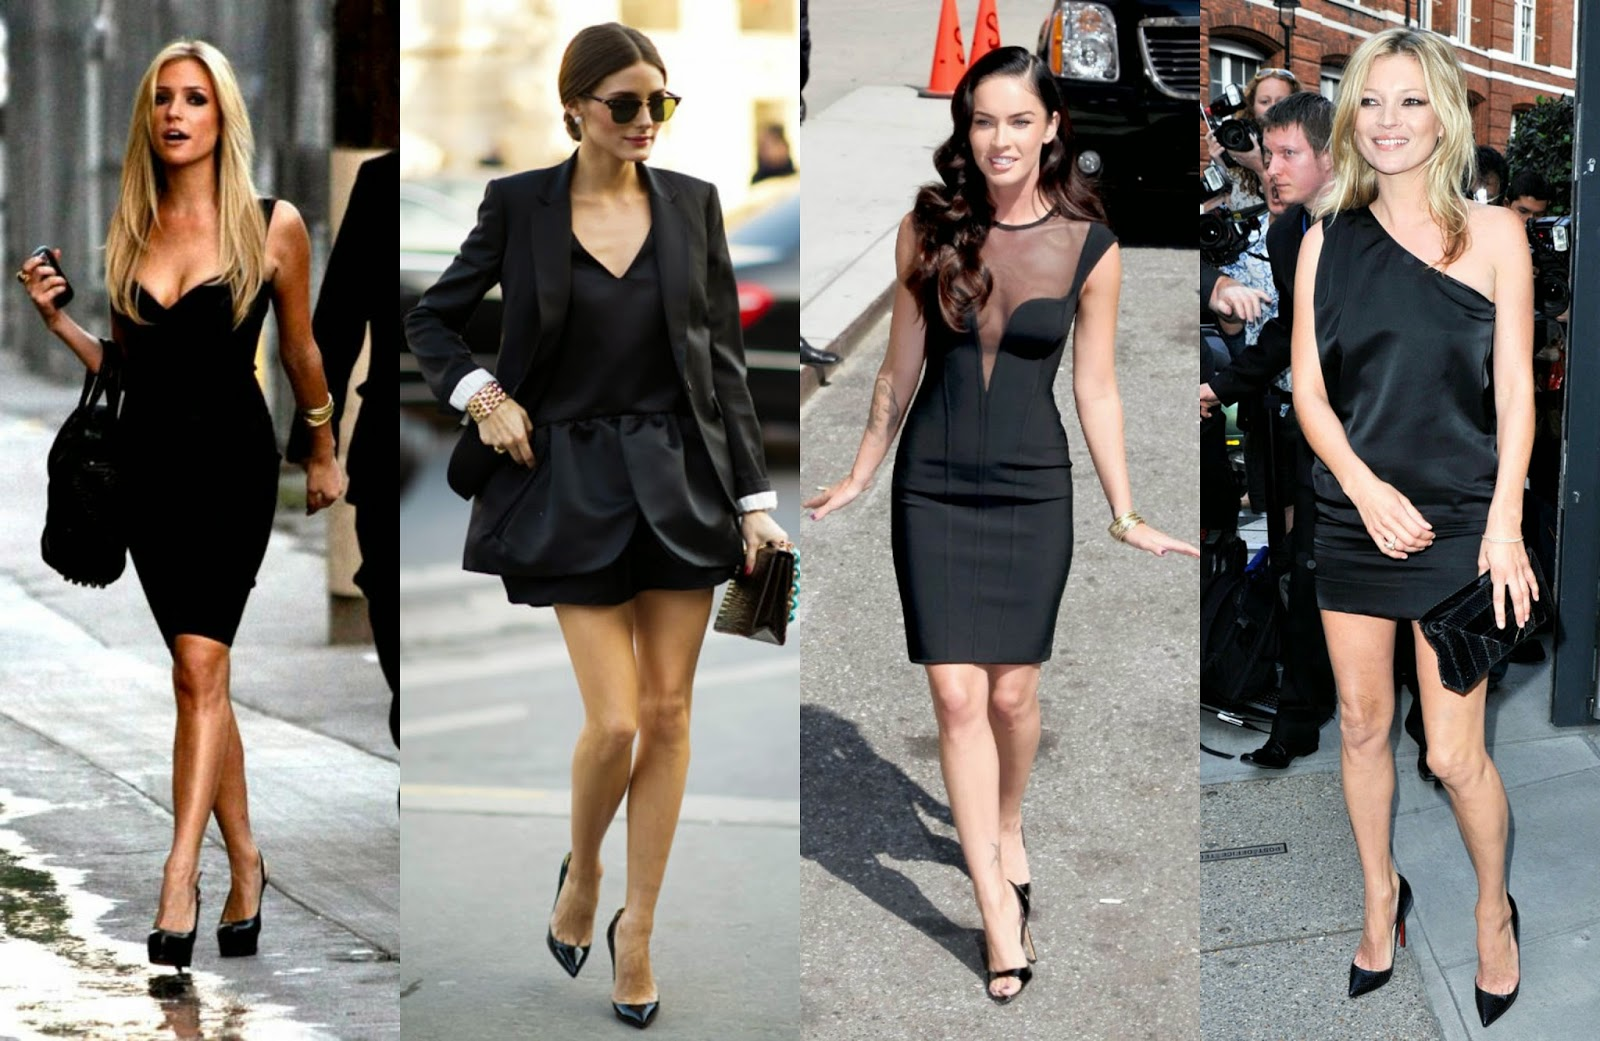 Club Fashionista: The Little Black Dress (LBD)